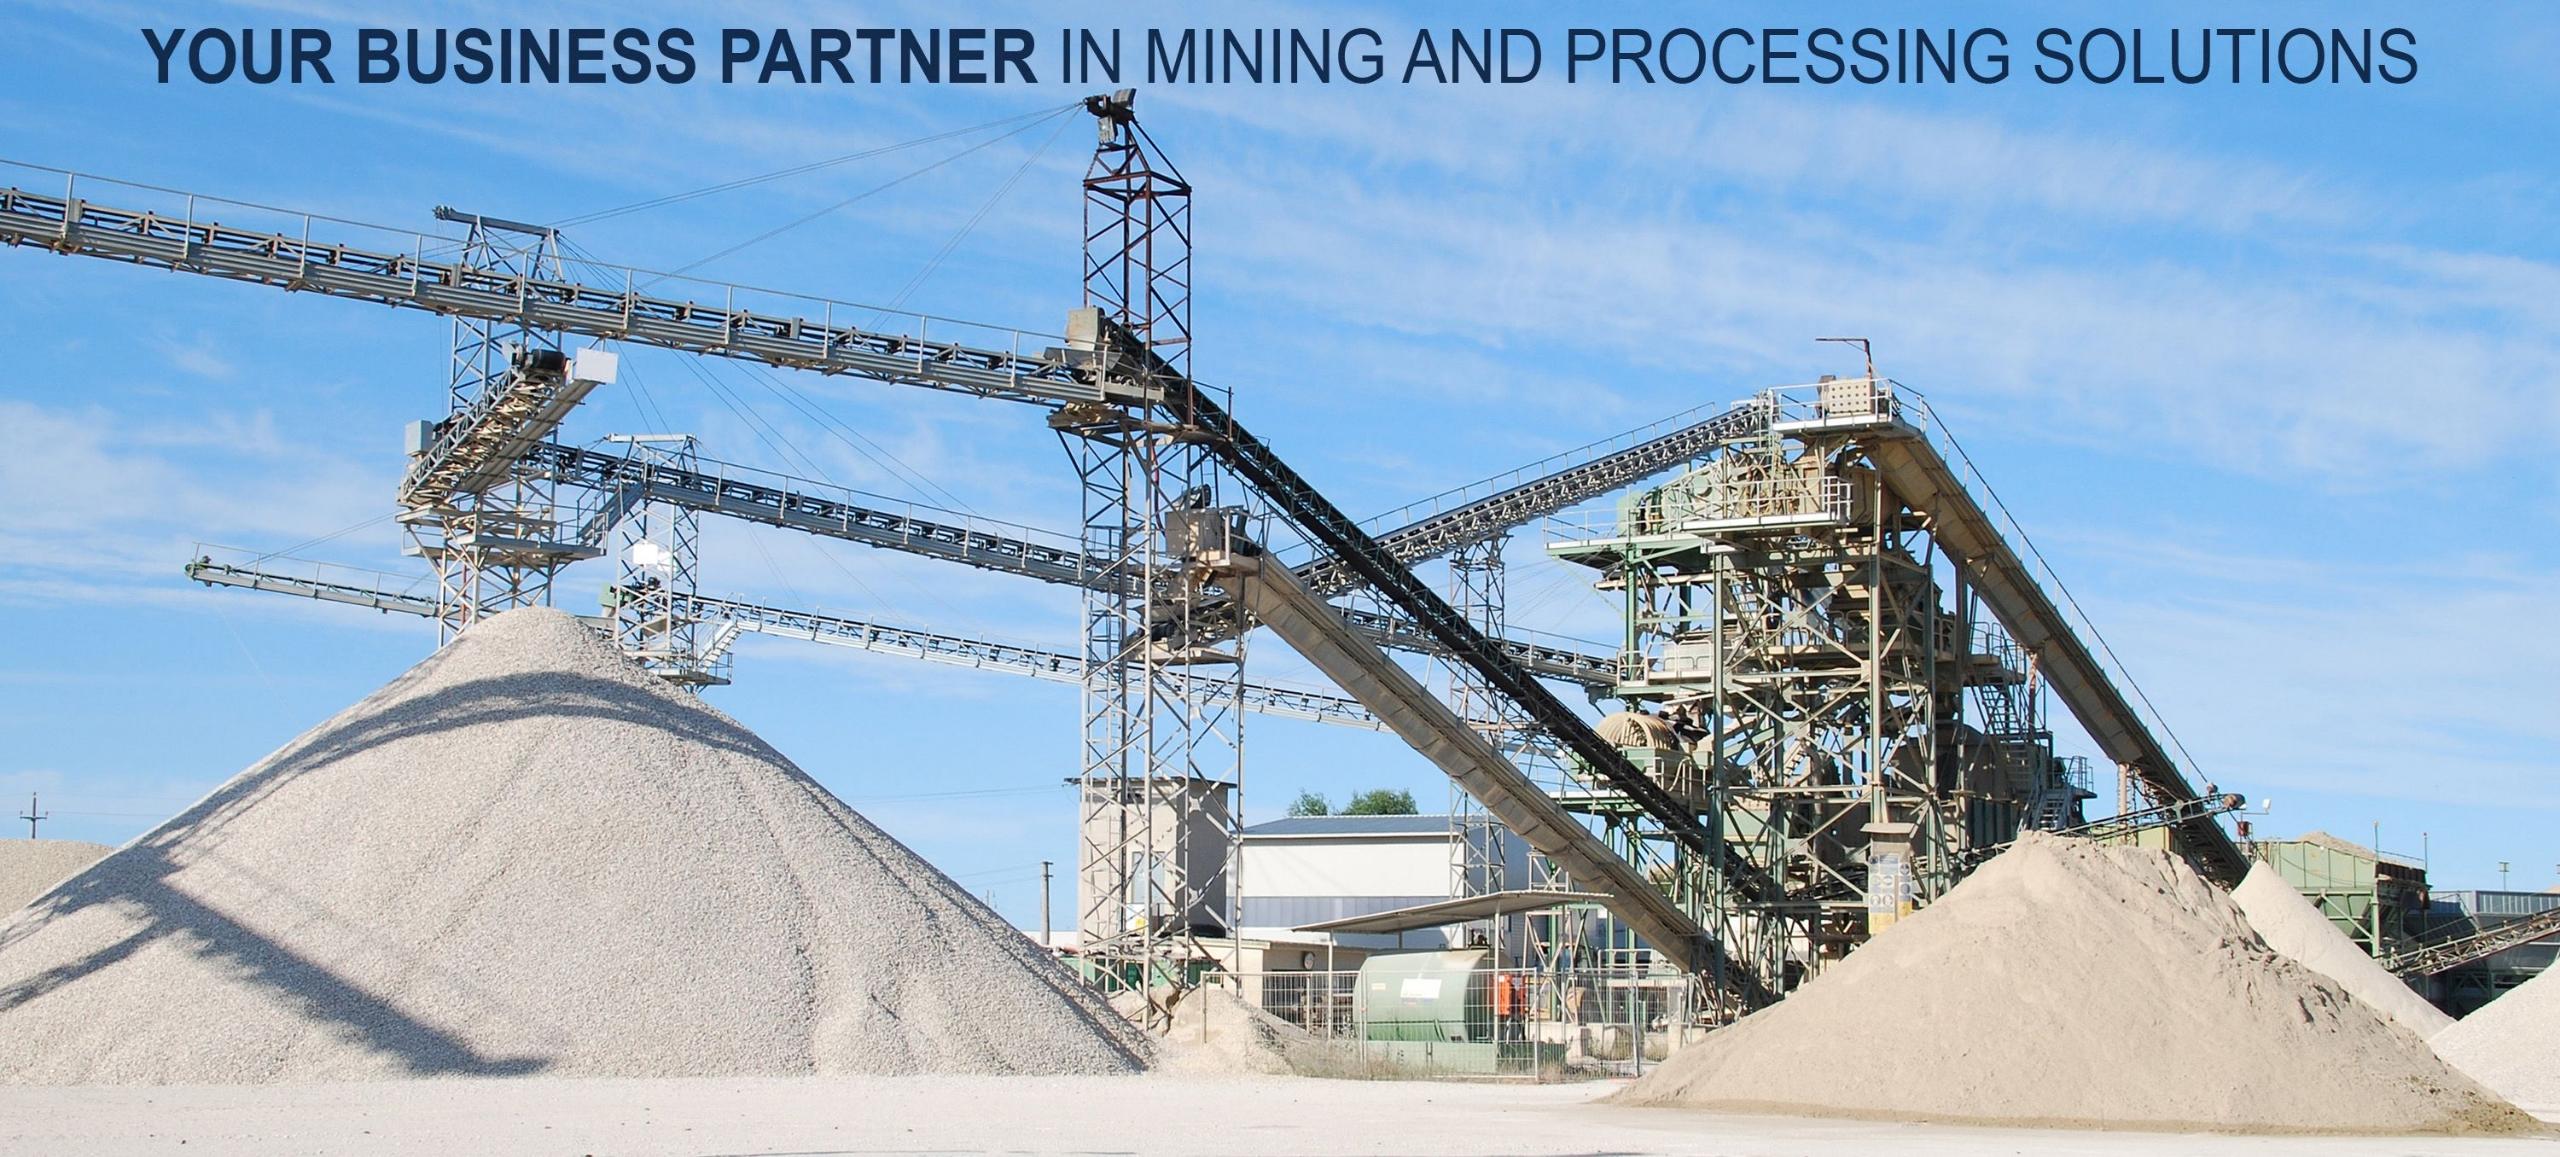 Diamond Mining Plants  (@manhattancorp) Cover Image